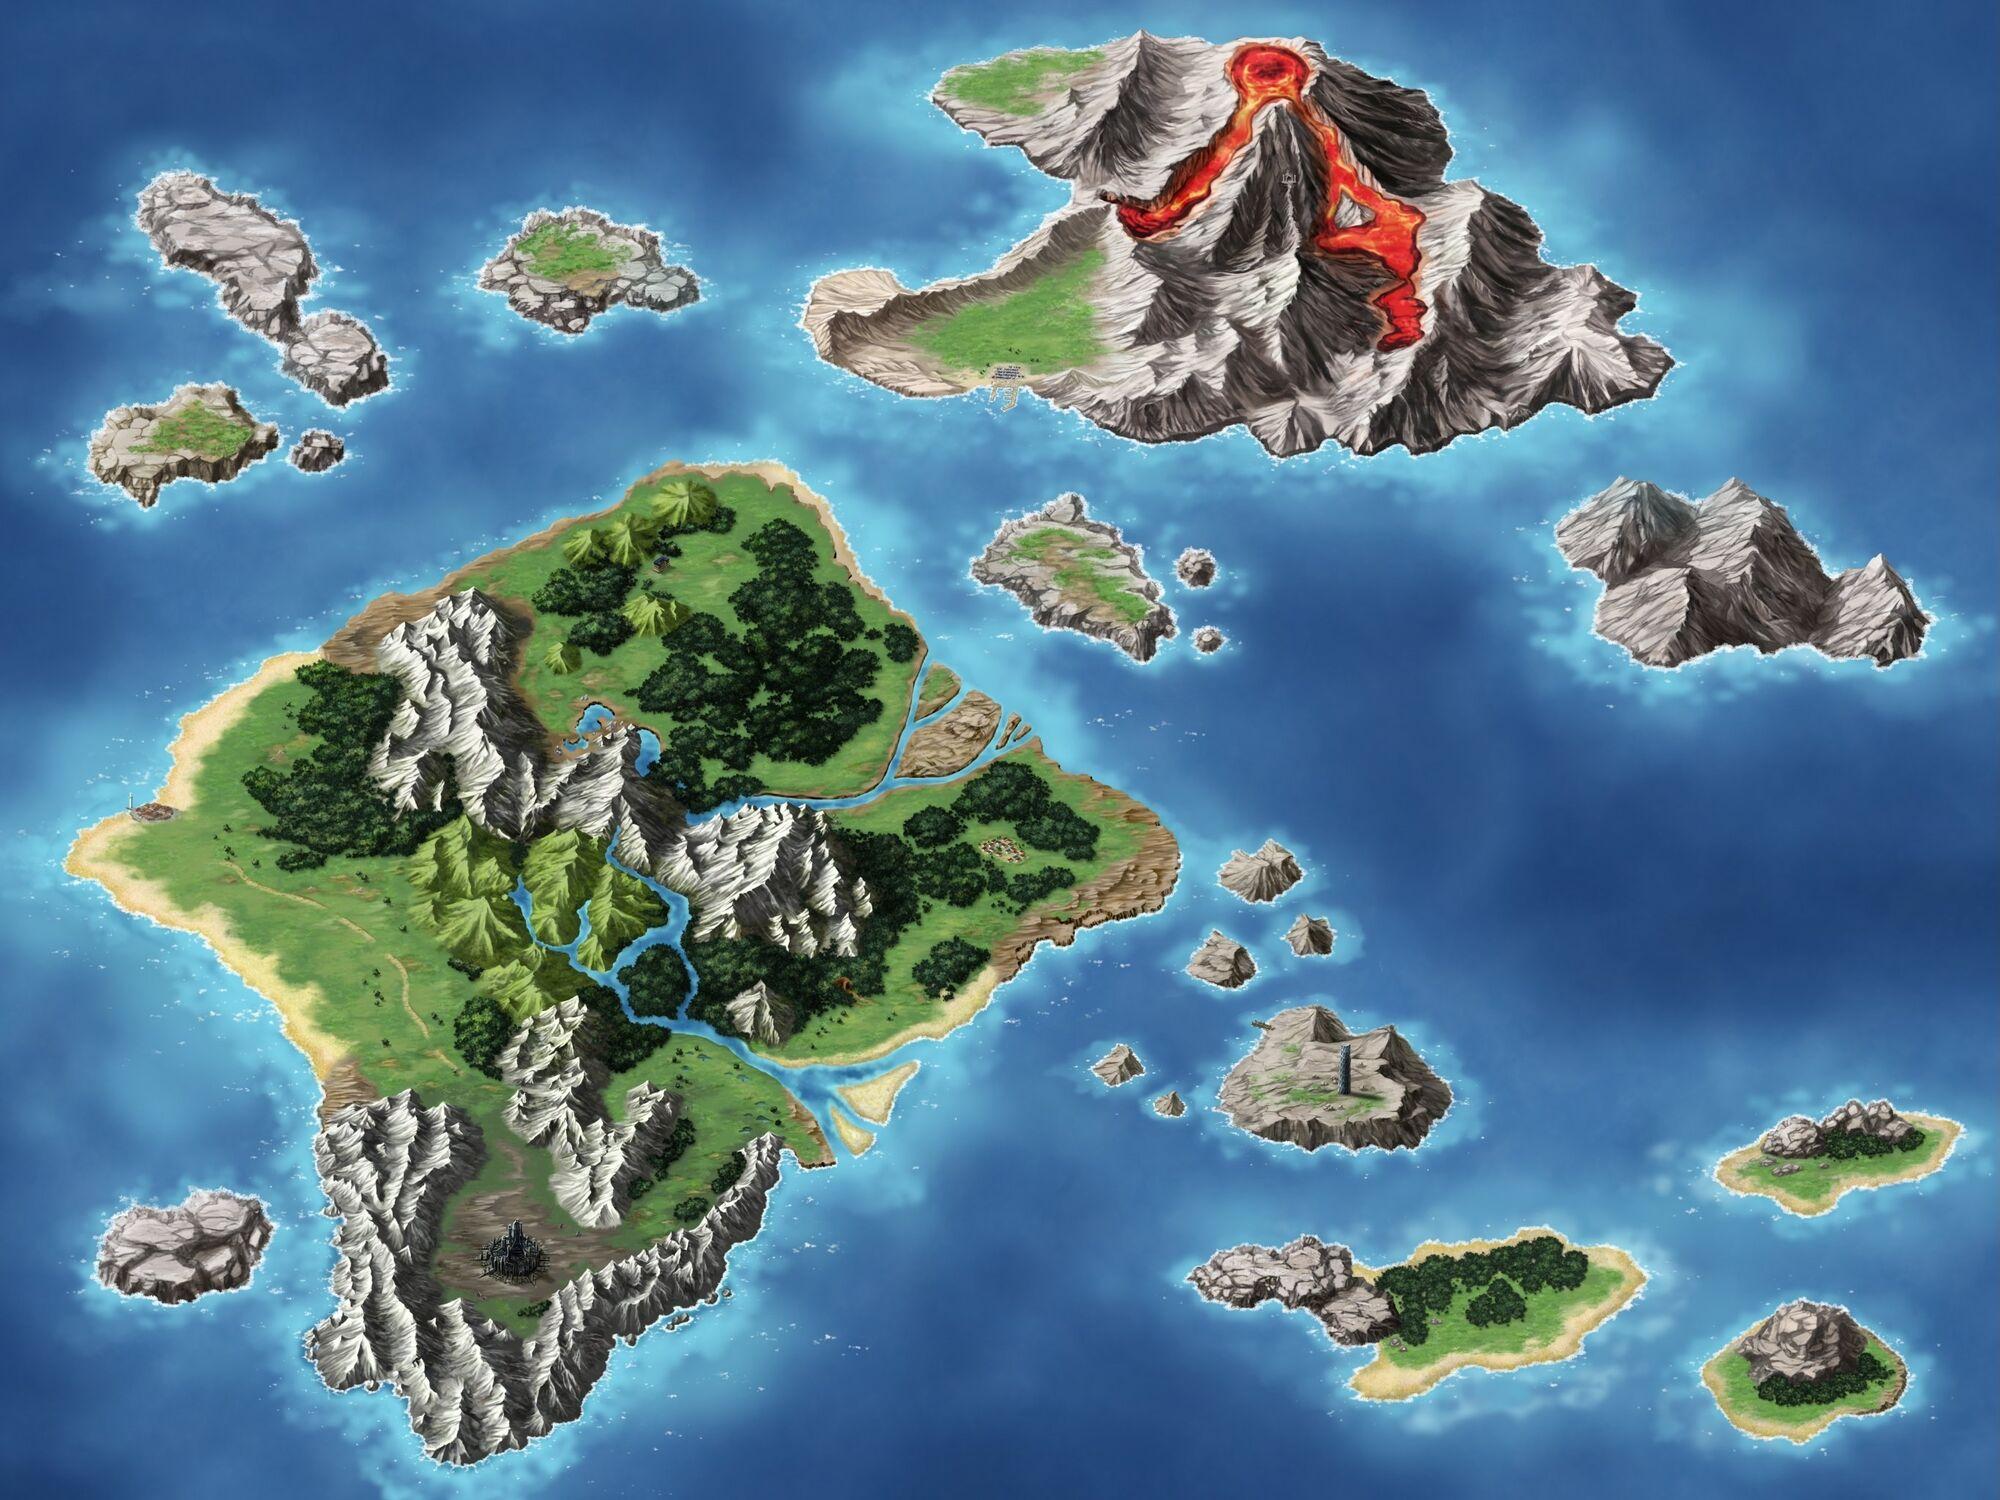 Grandshelt Isles Final Fantasy Wiki Fandom Powered By Wikia